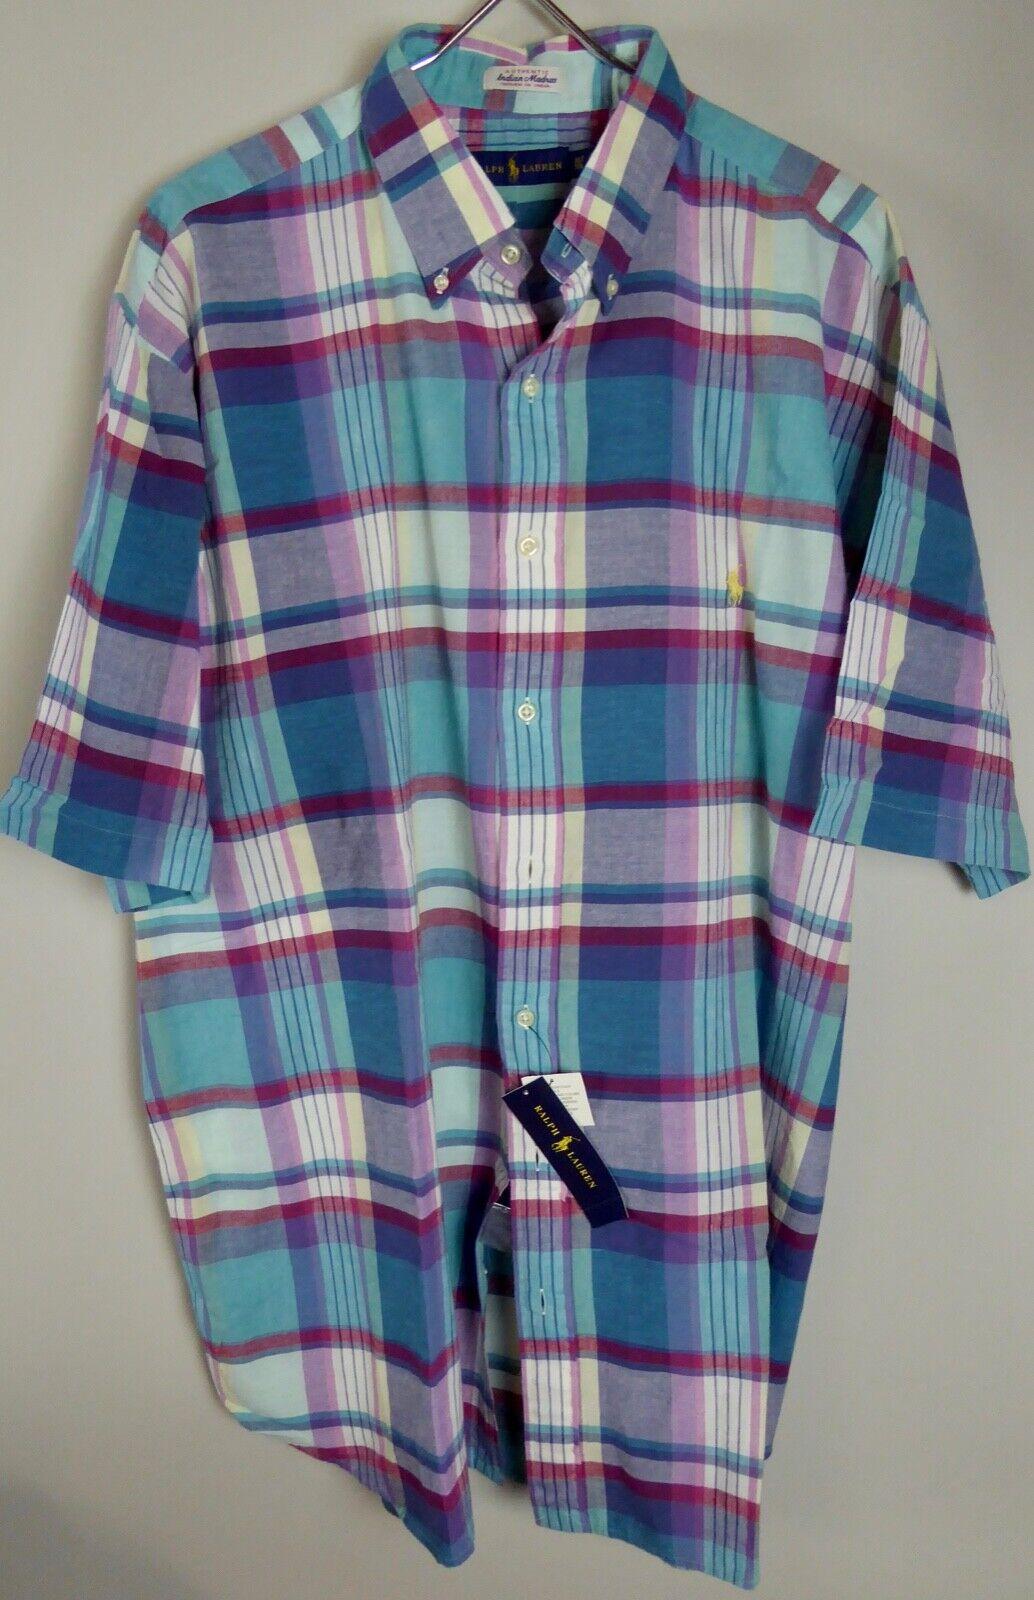 Polo Ralph Lauren SS Woven Indian Madras 100% Cotton Plaid Shirt NWT  -